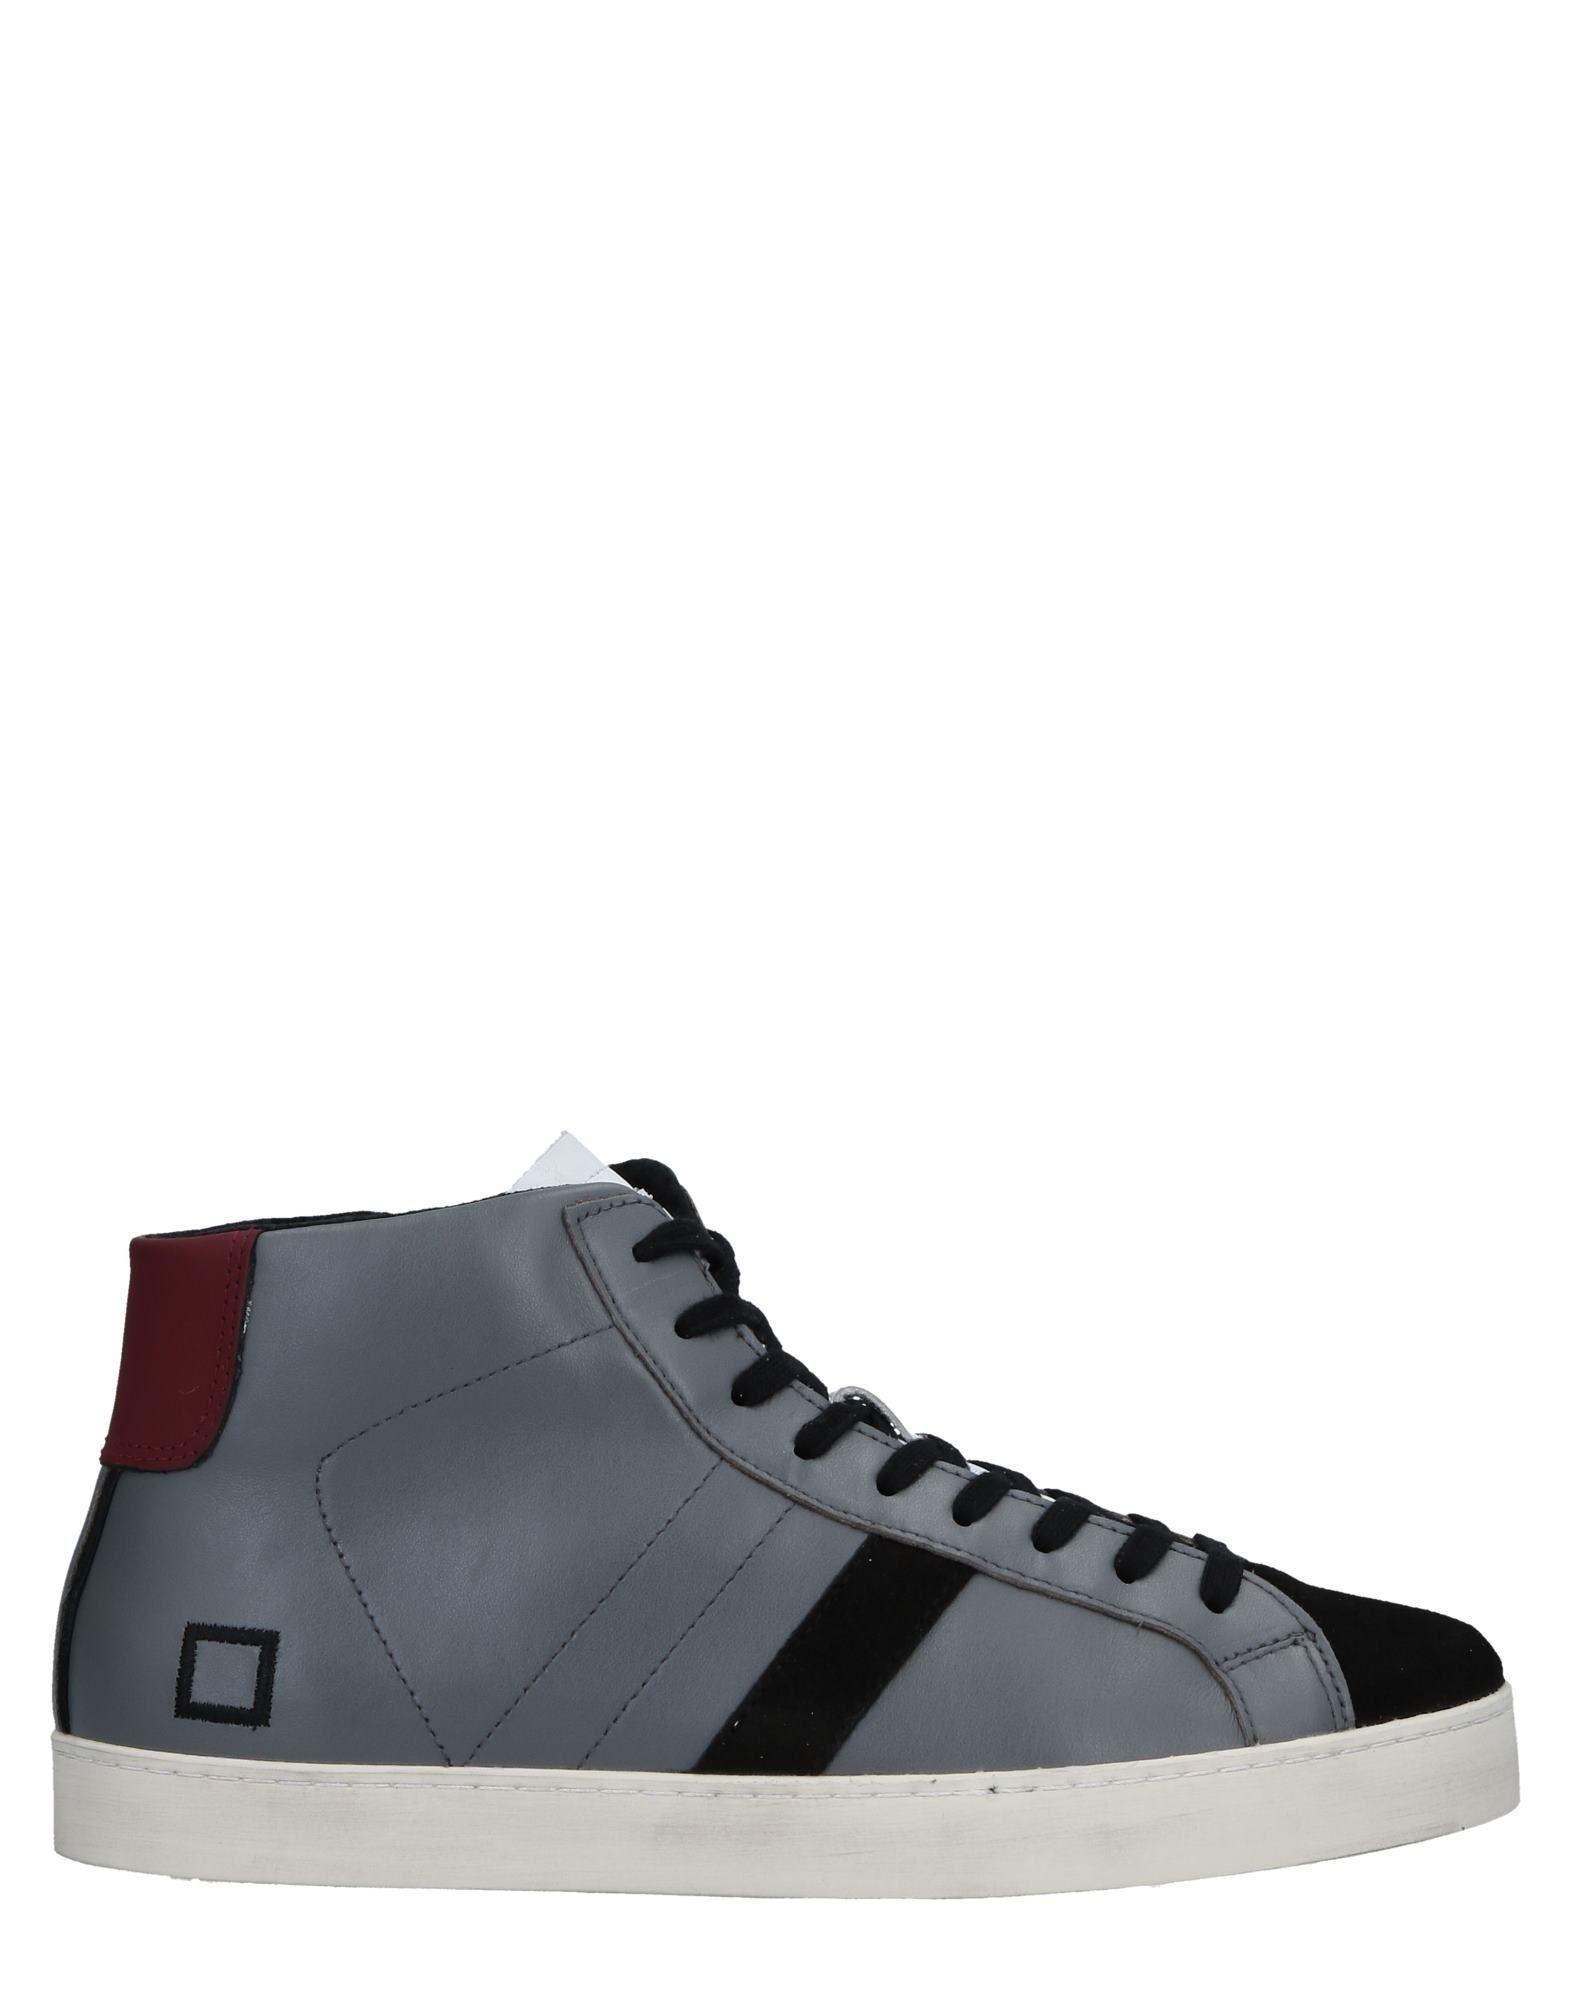 Rabatt echte Schuhe D.A.T.E. Sneakers Herren  11519177MK